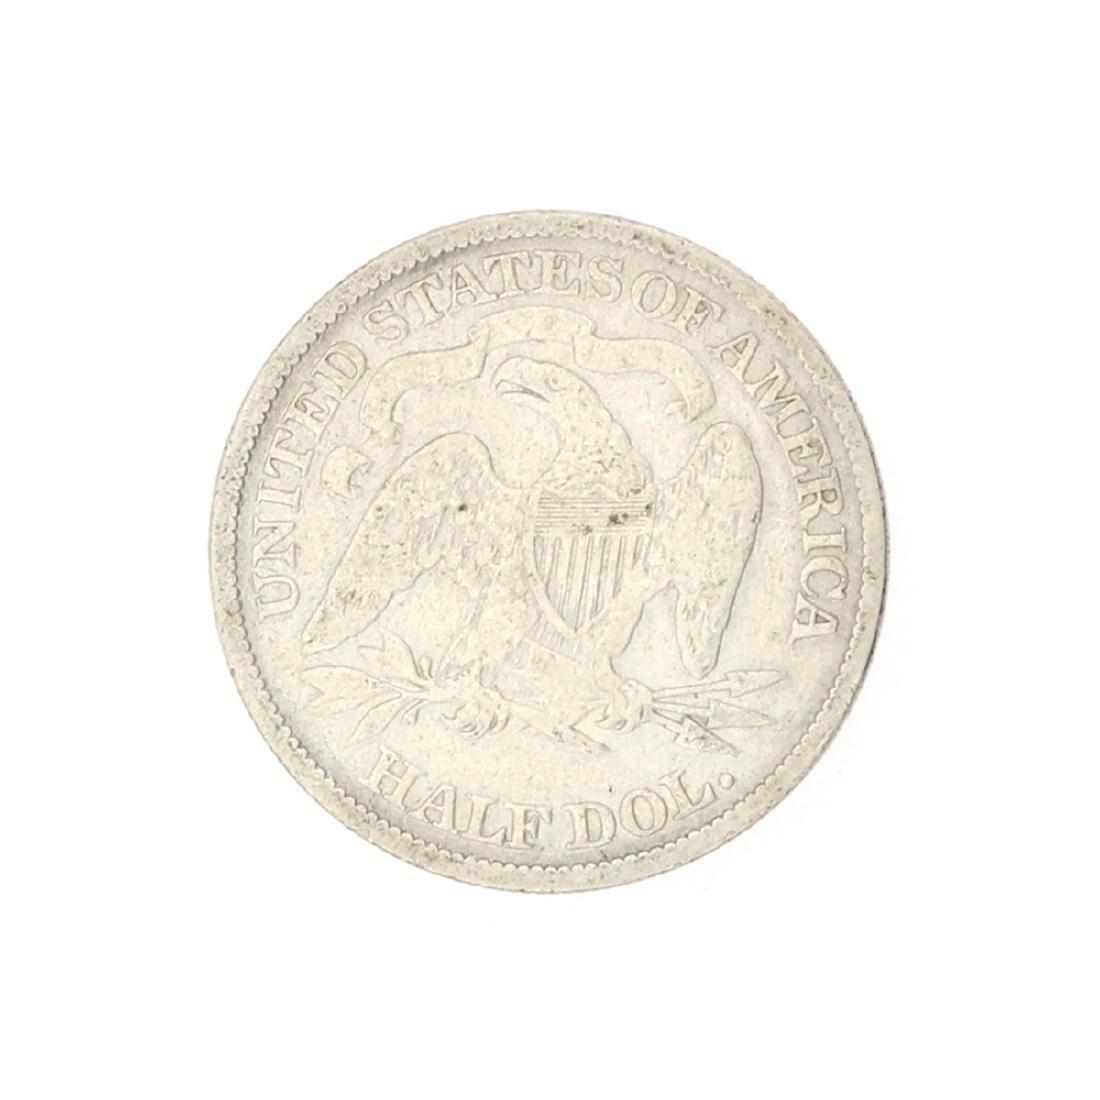 1876 Liberty Seated Half Dollar Coin - 2